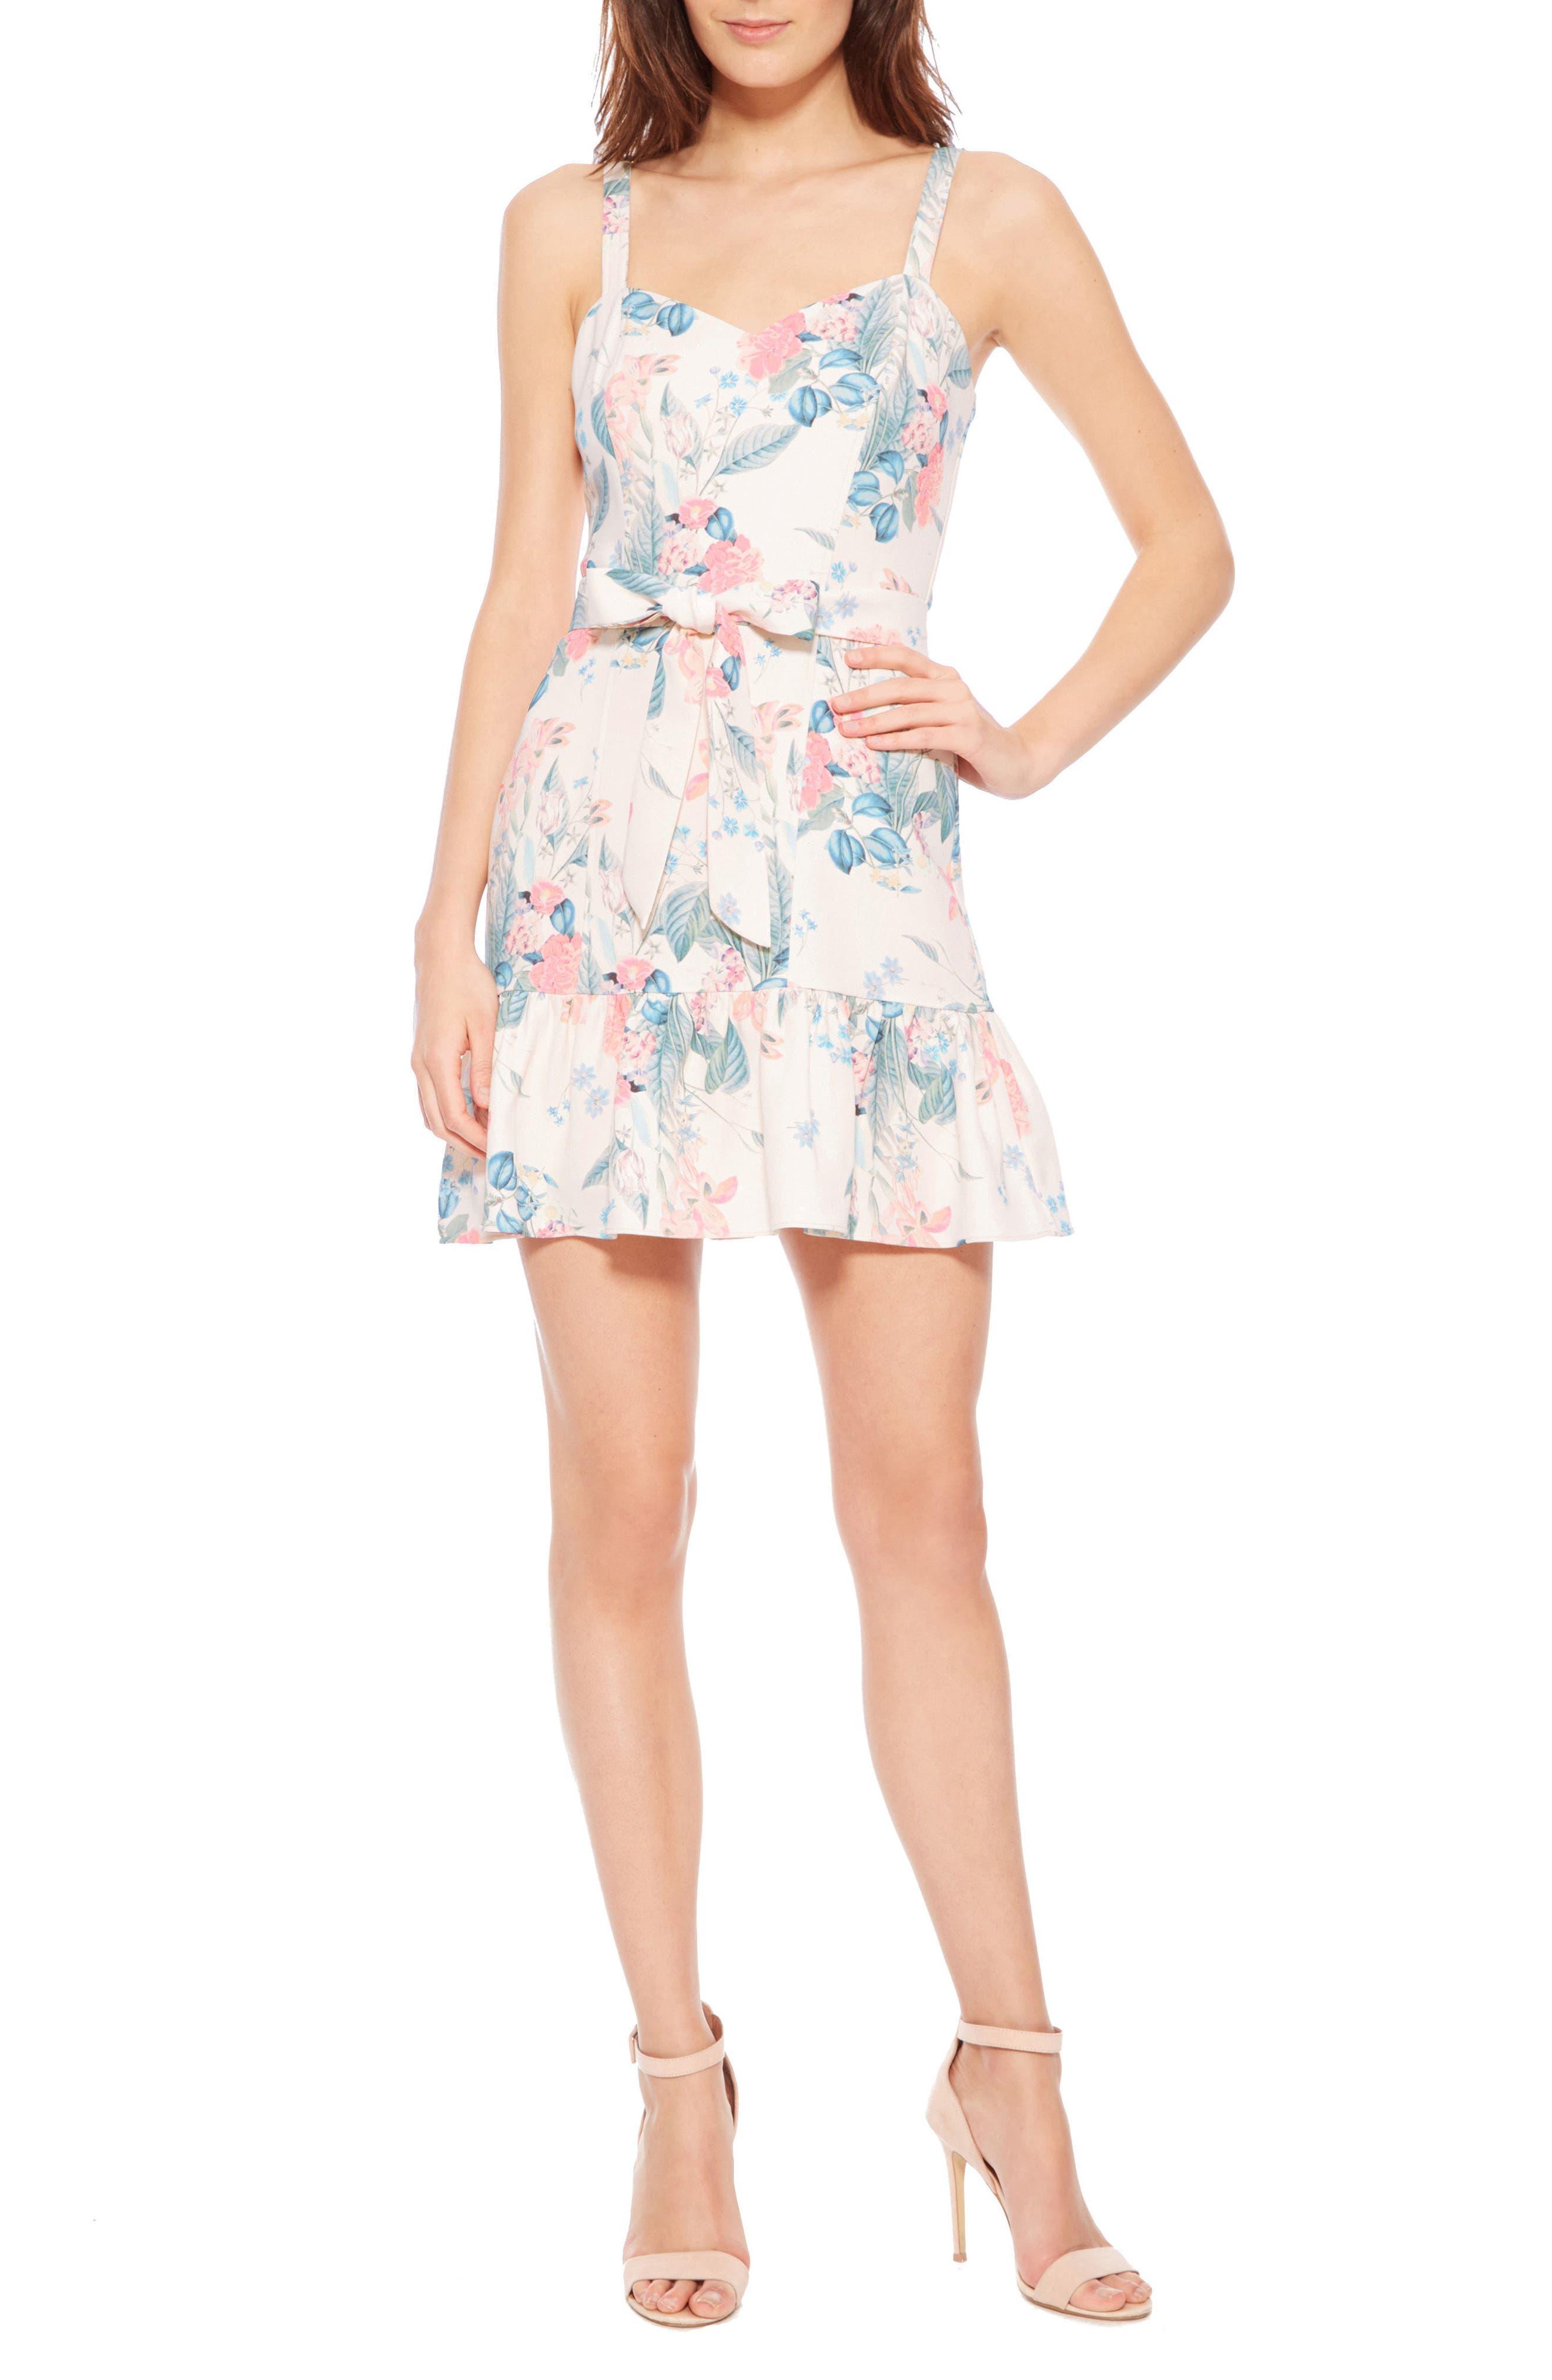 Yuna Dress,                             Main thumbnail 1, color,                             MELLOW MEADOW